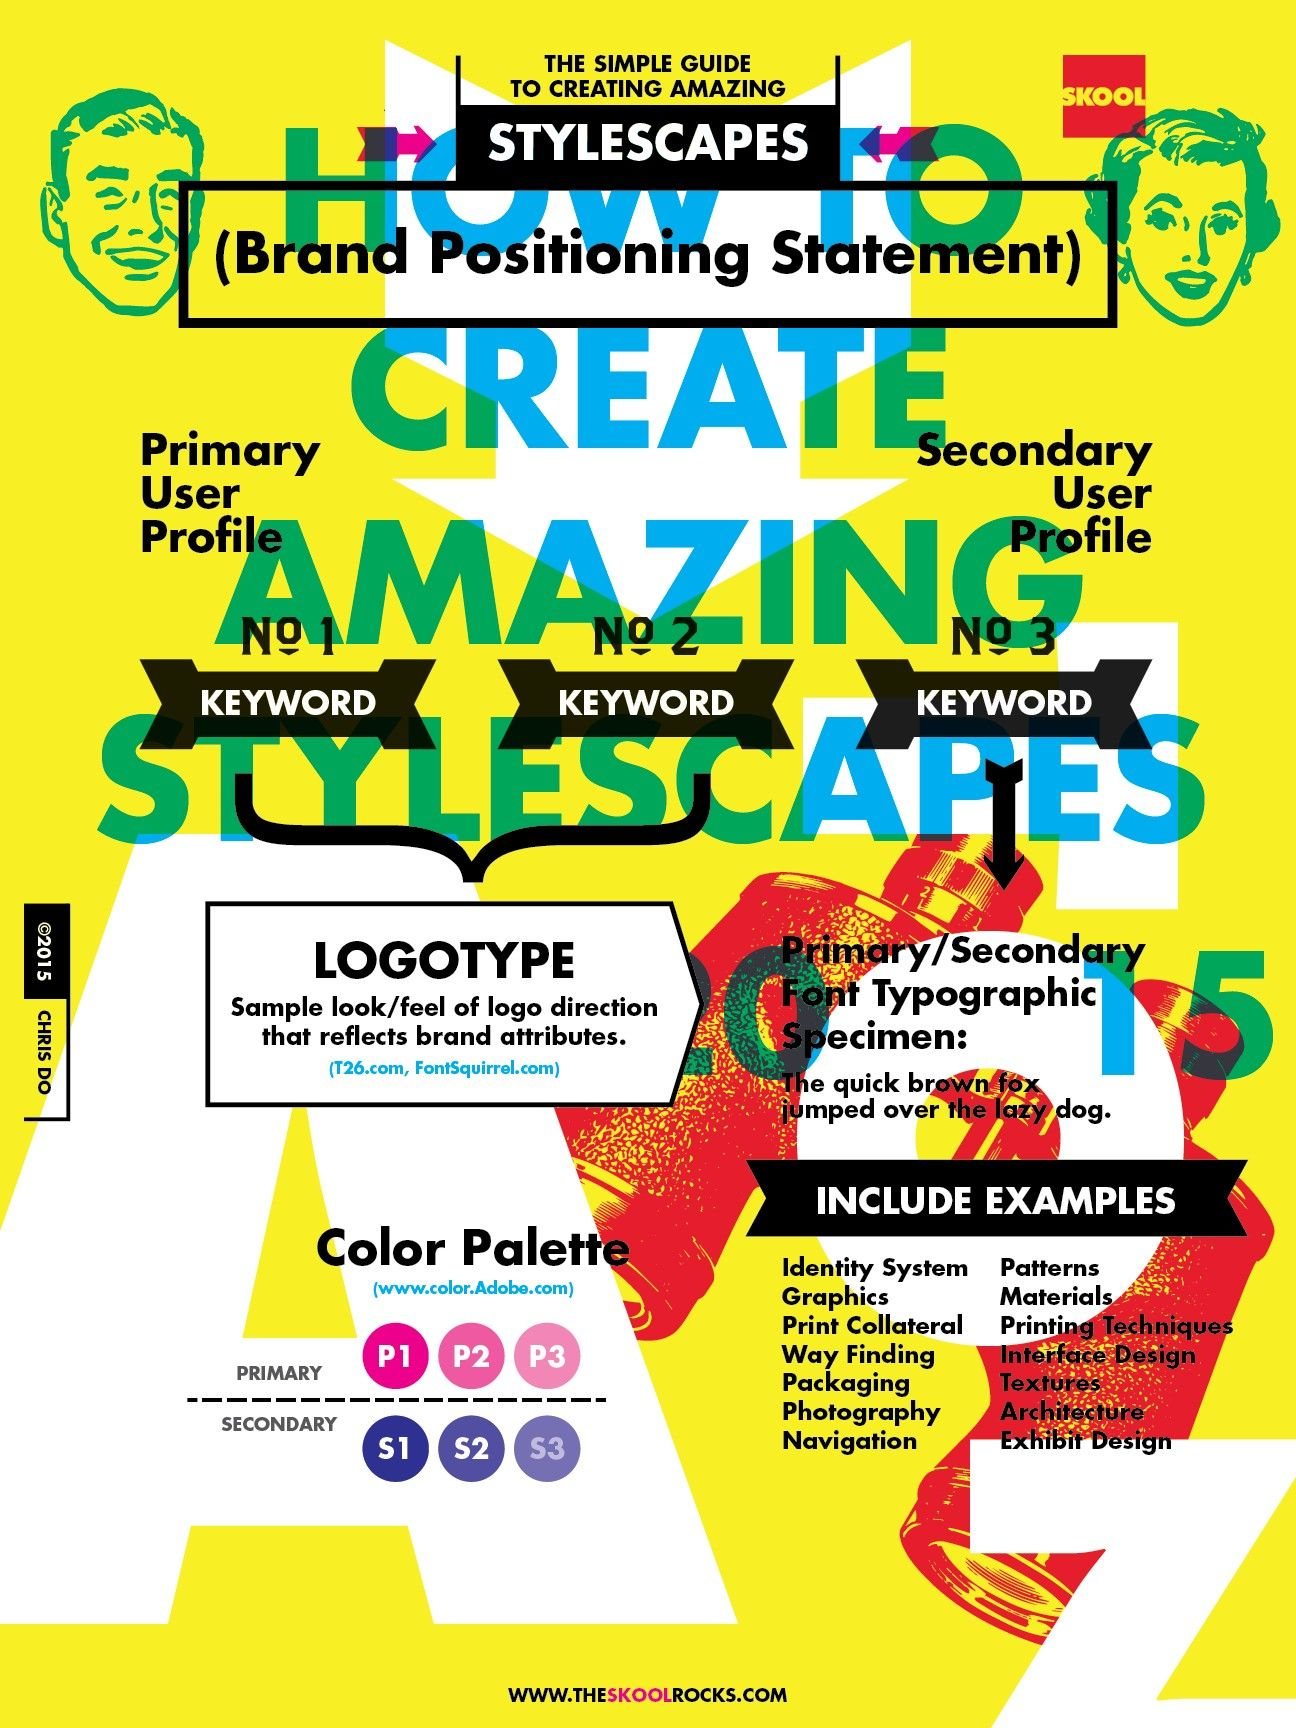 Stylescape Graphic Design: Branding Design, Design Guidelines